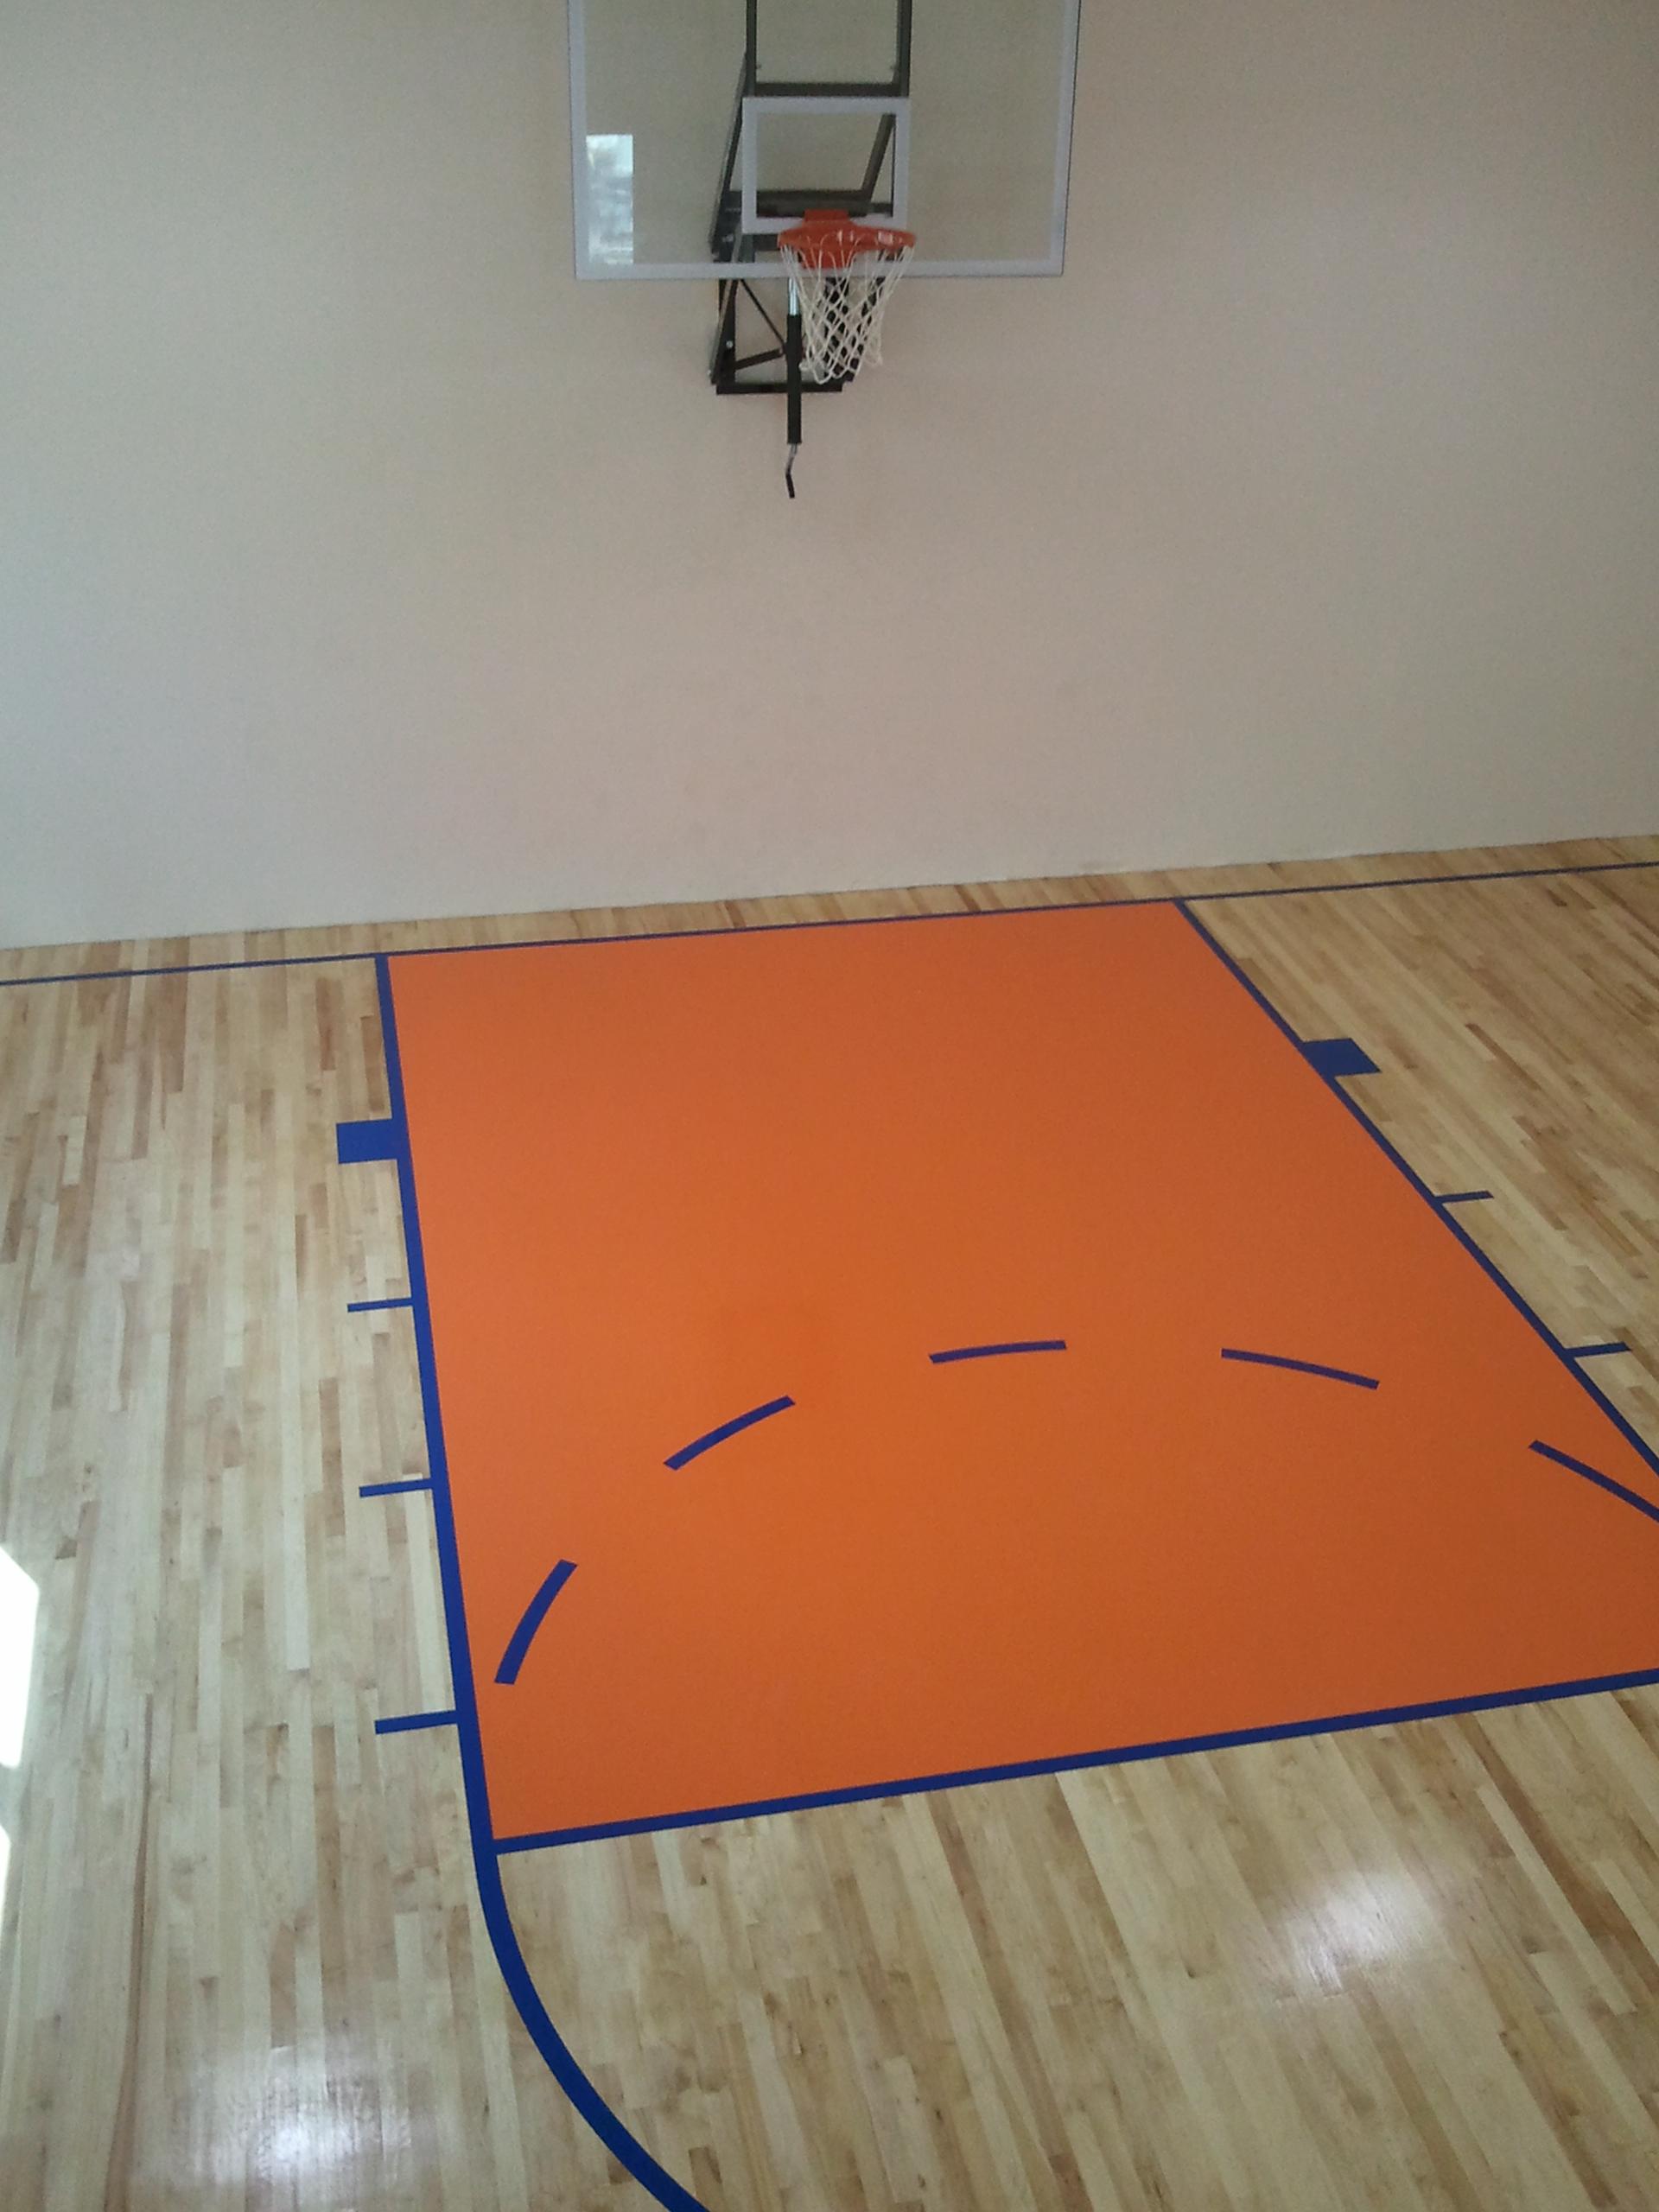 to chemically l strip basketball wood how com floors floor woodfloordoctor